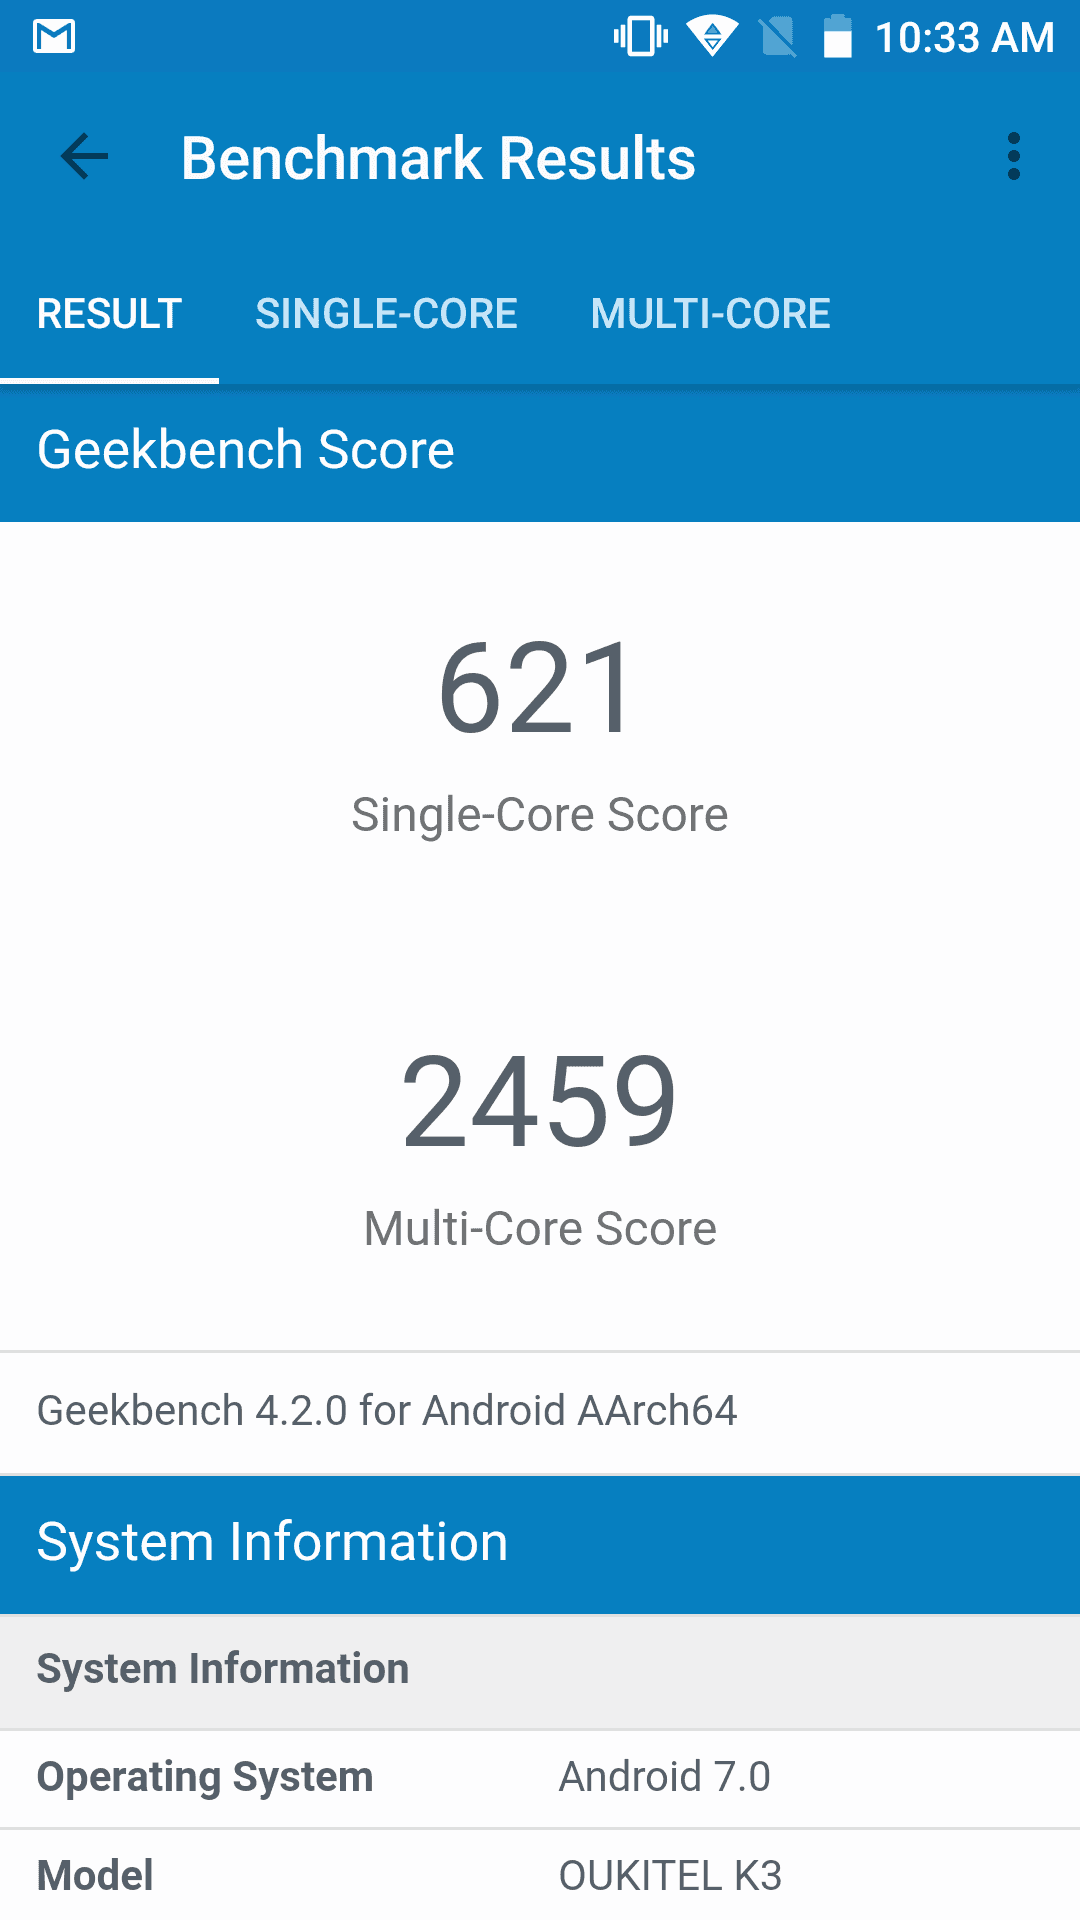 OUKITEL K3 Benchmarks 1